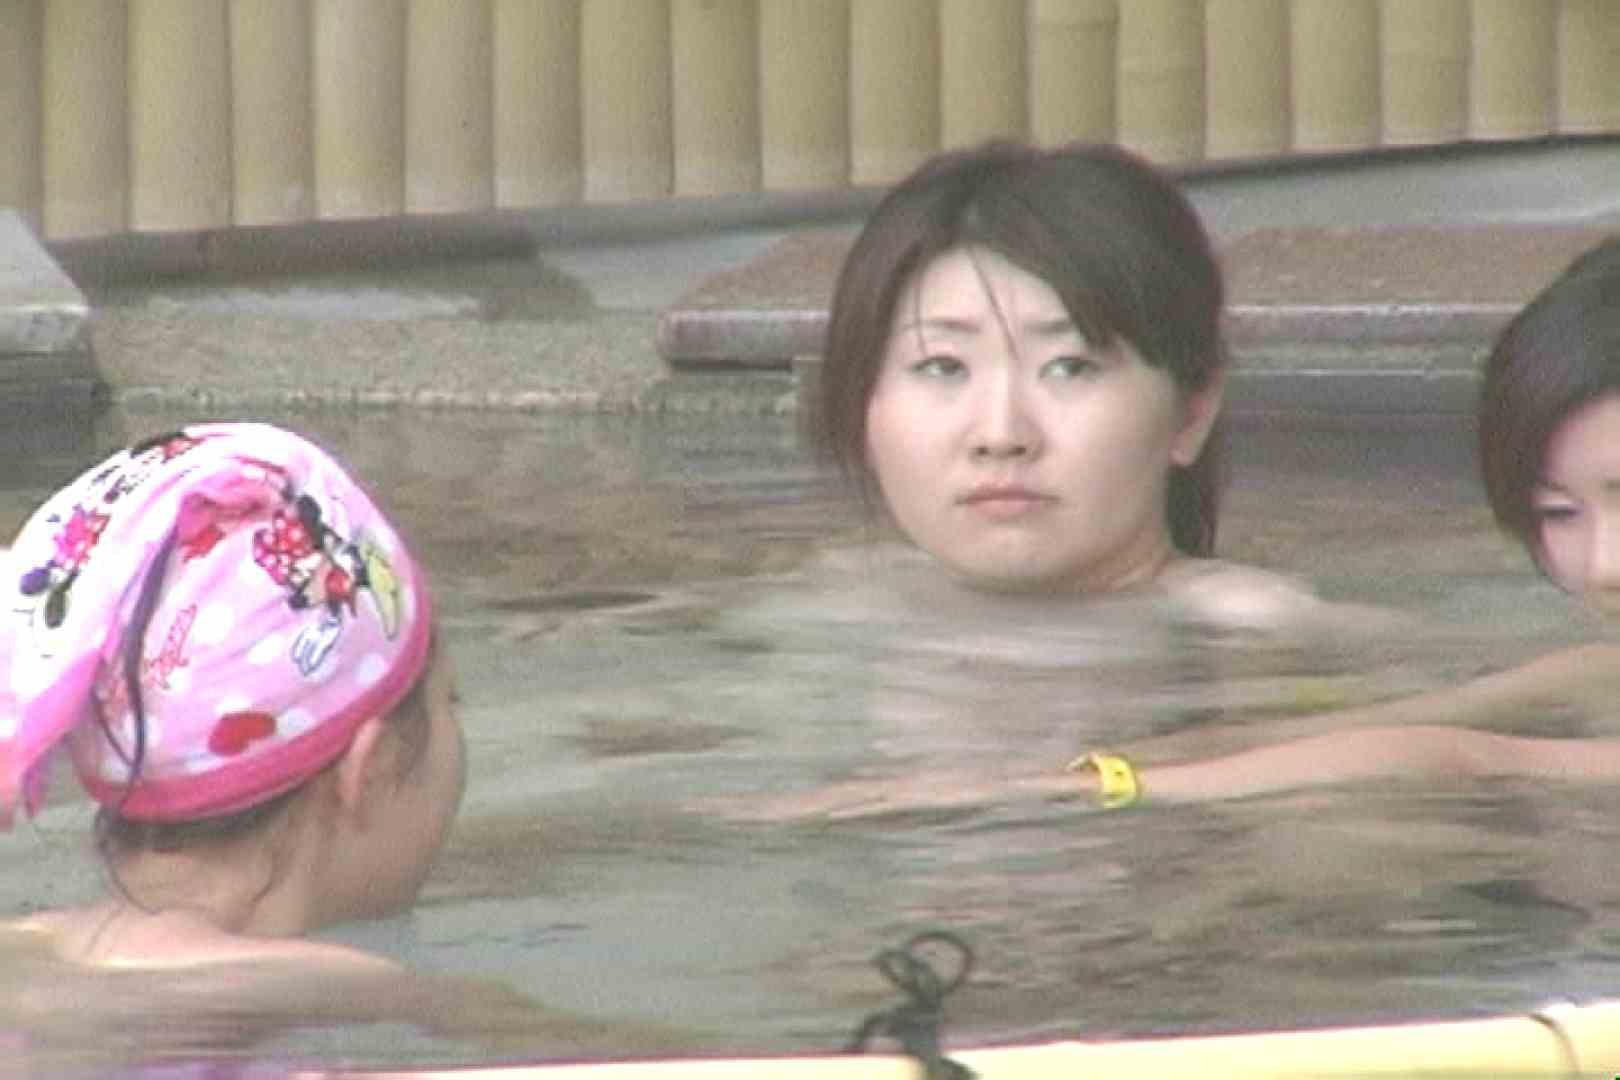 Aquaな露天風呂Vol.25 0 | 0  47連発 43